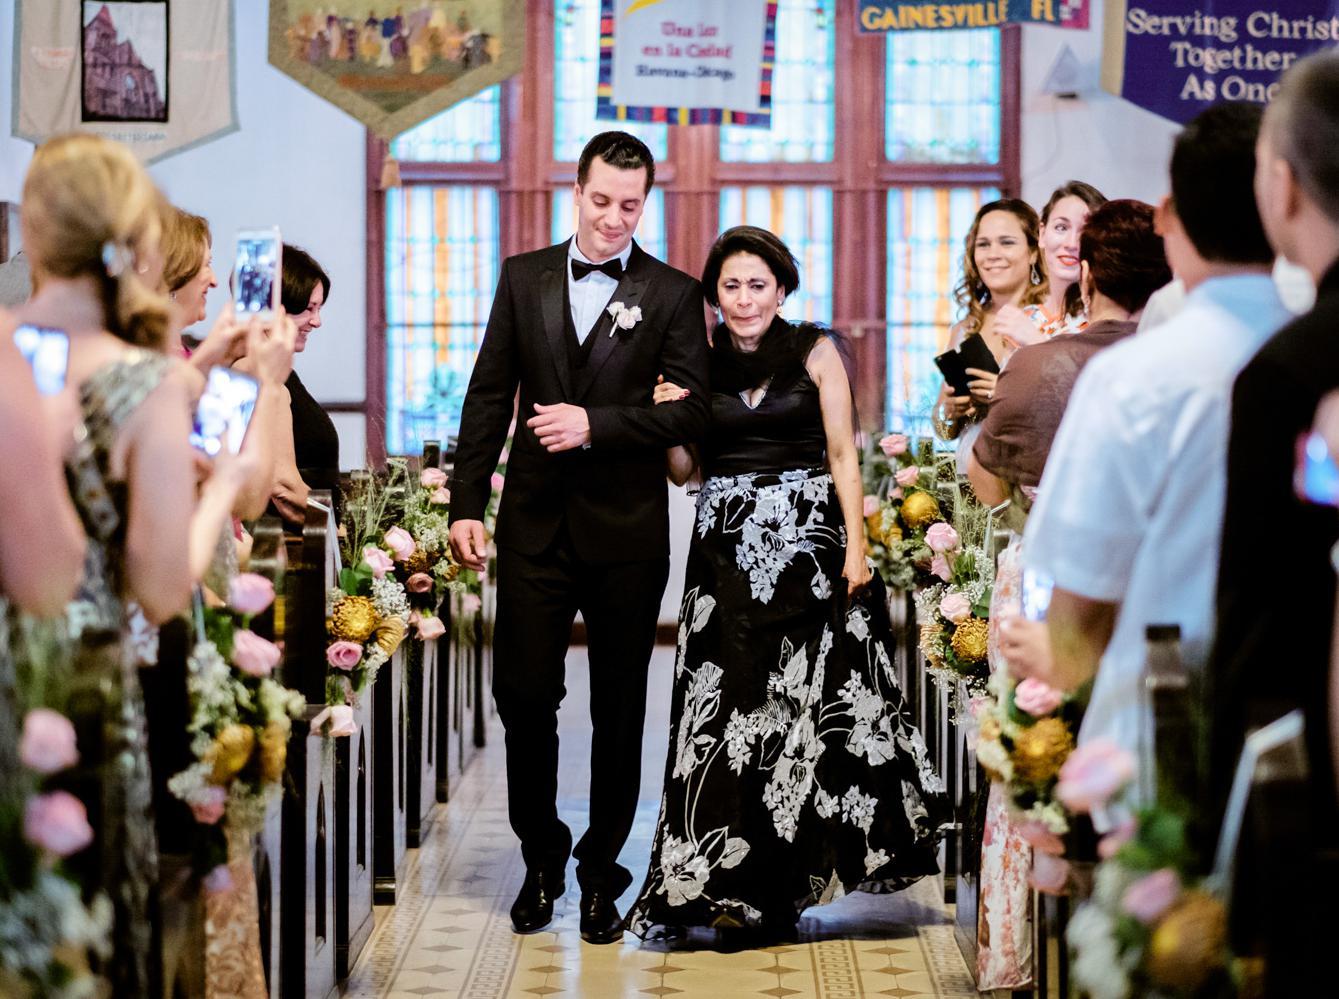 bodas-sin-clasificar-sin-tema-cuba-27581.jpg